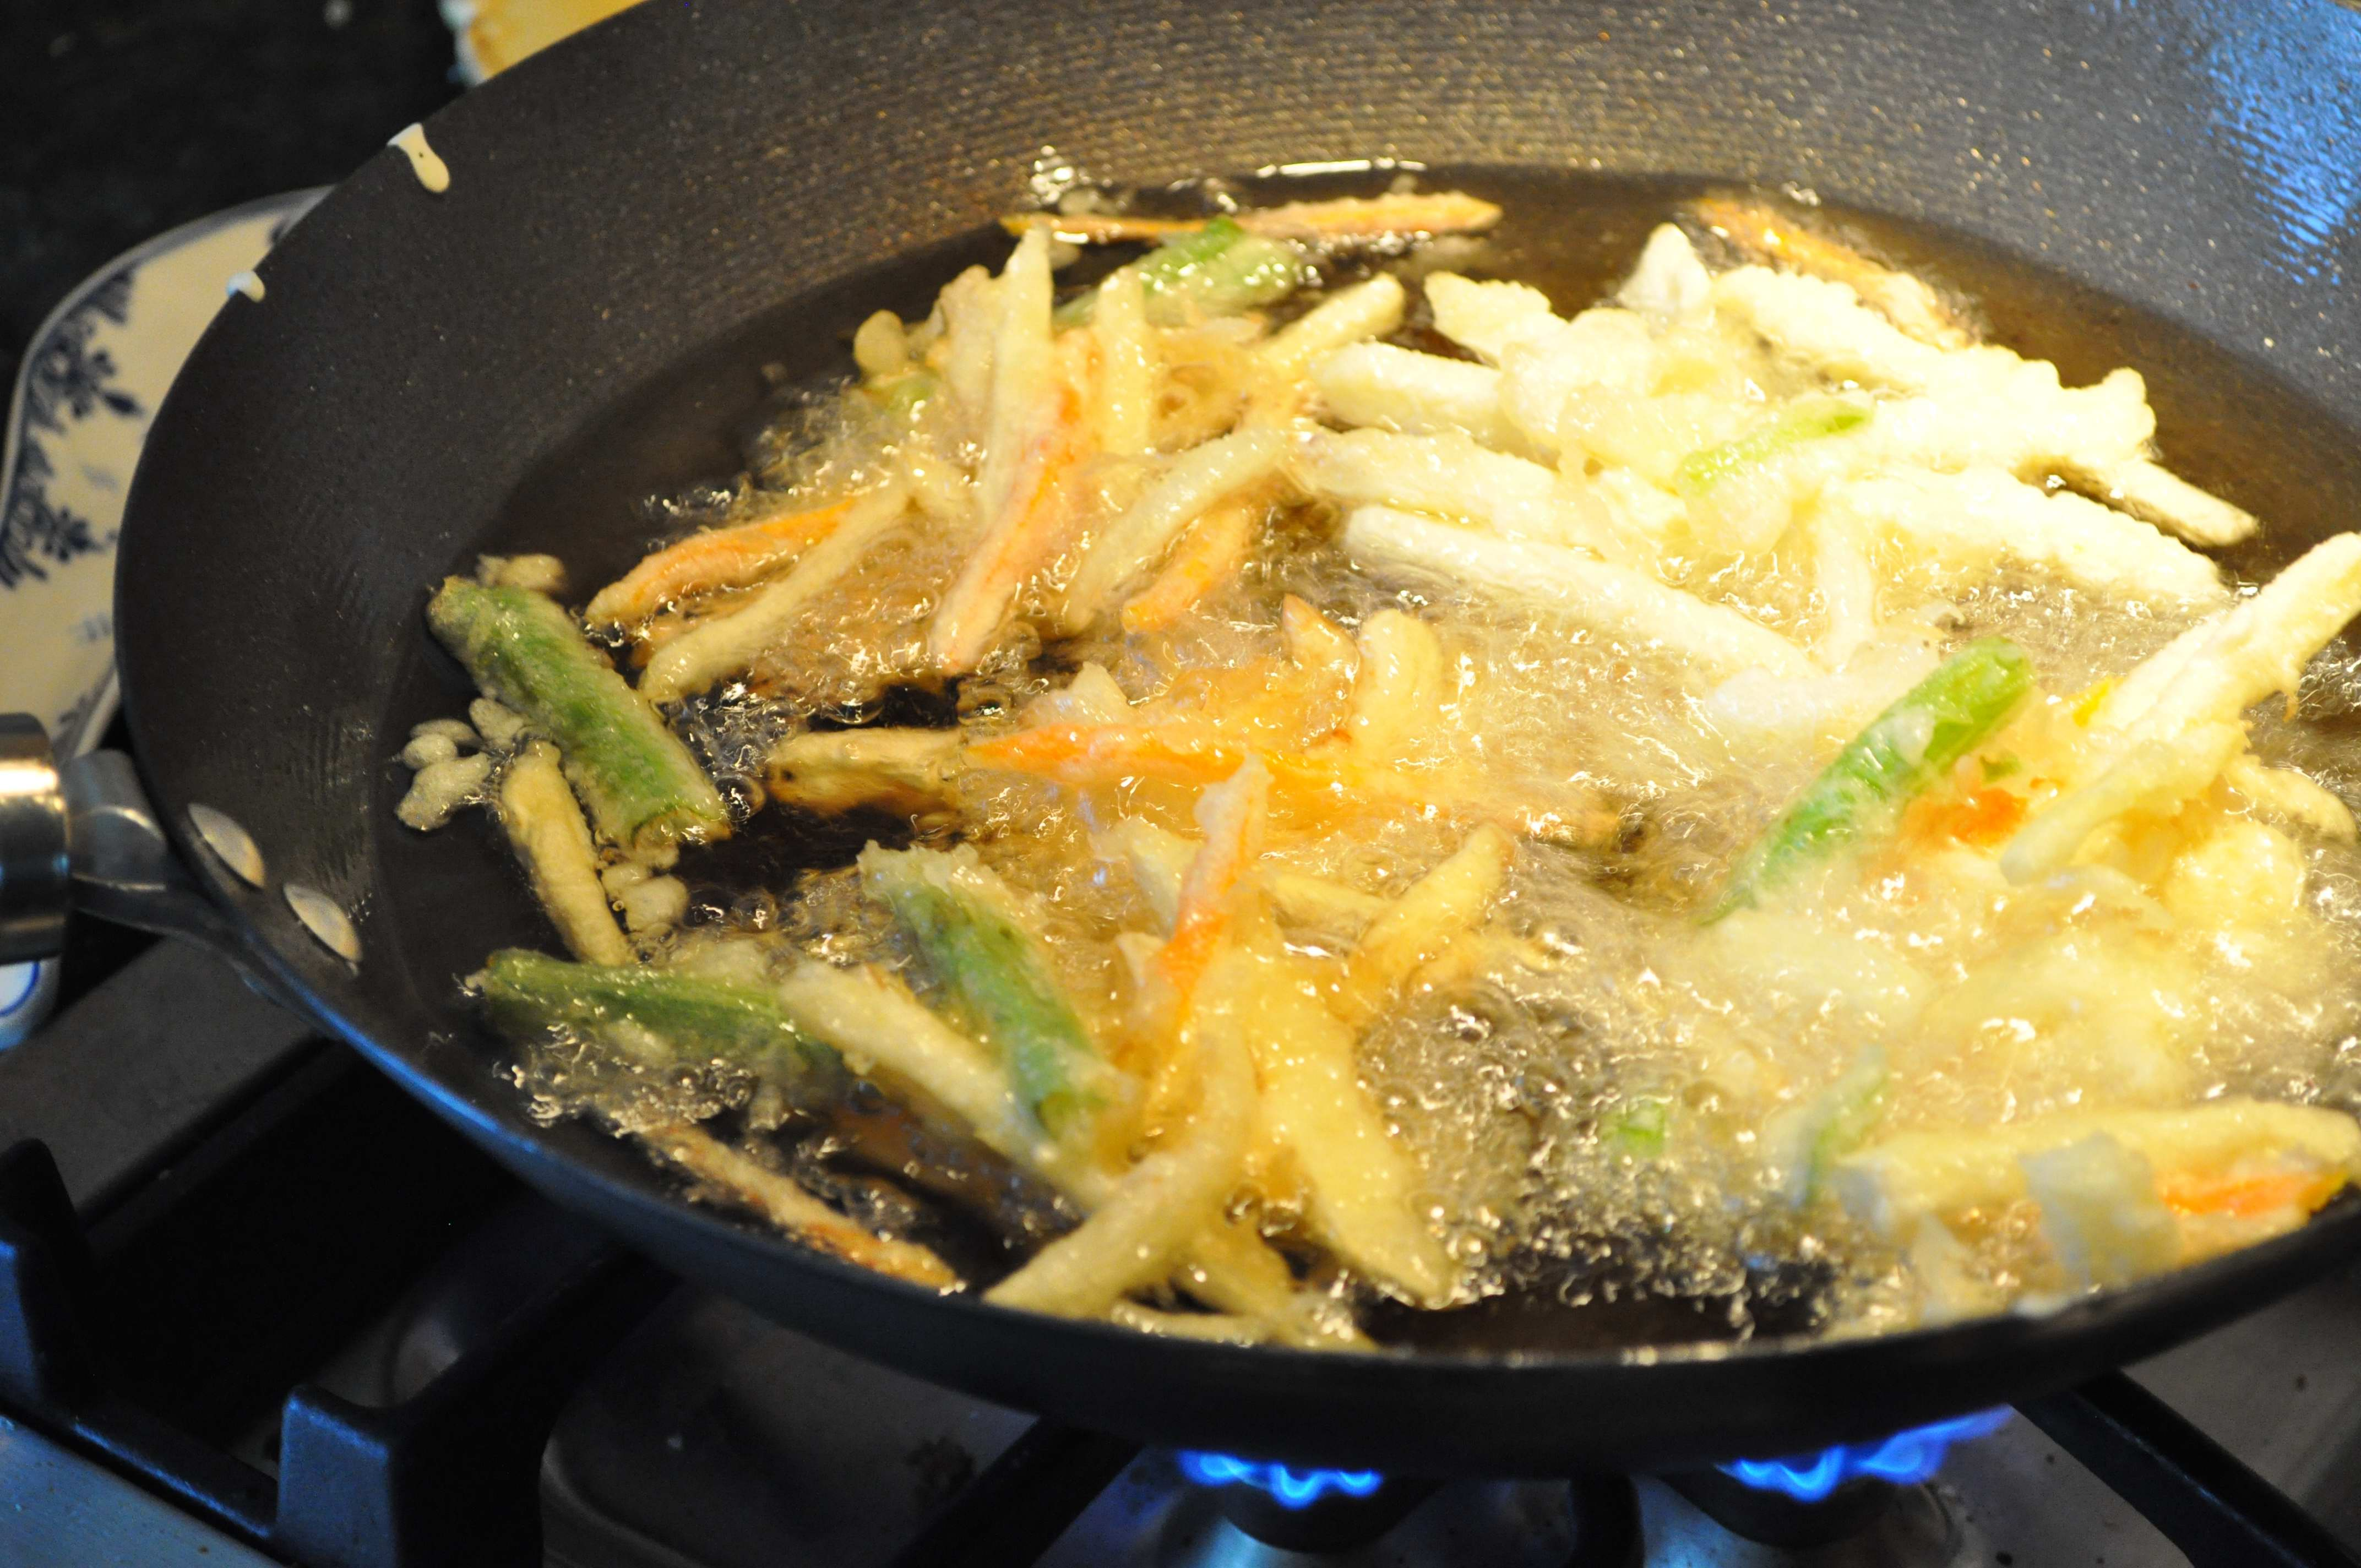 Vegetables frying in oil